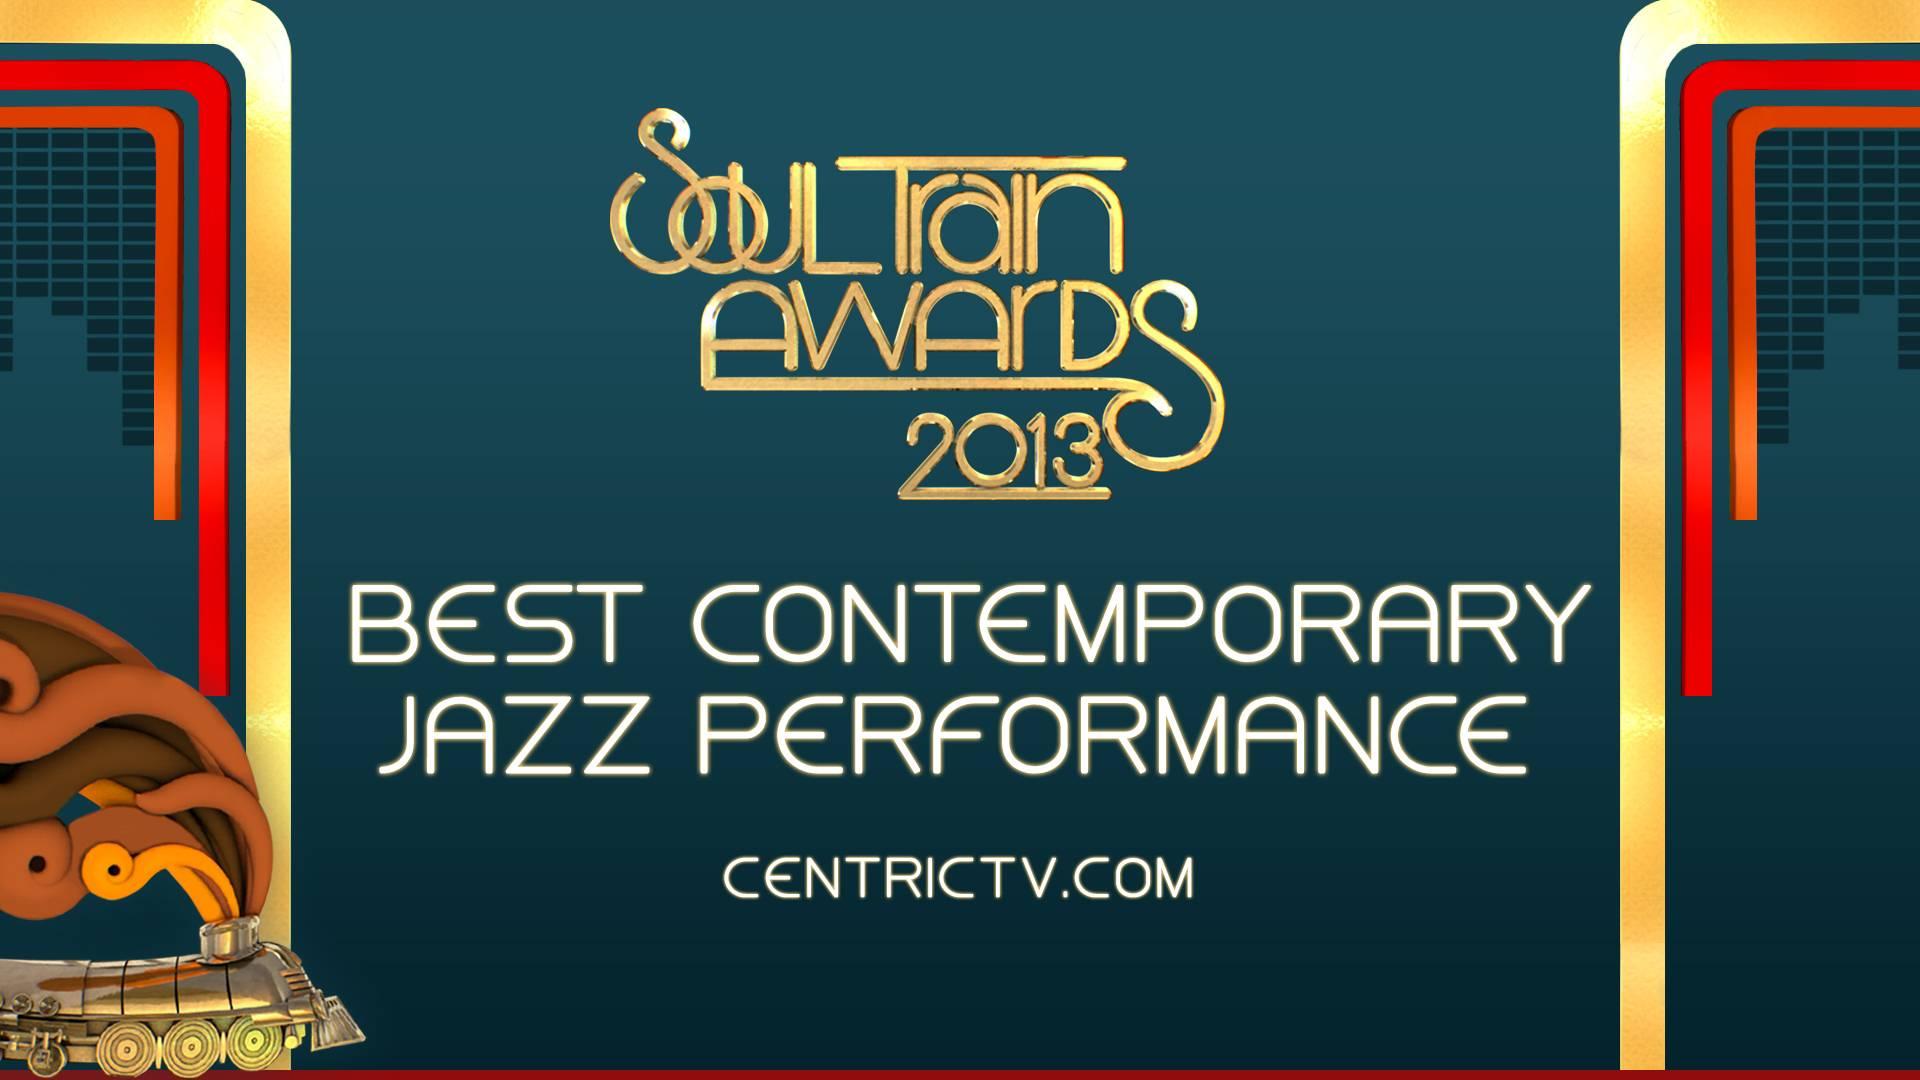 Best Contemporary Jazz Performance